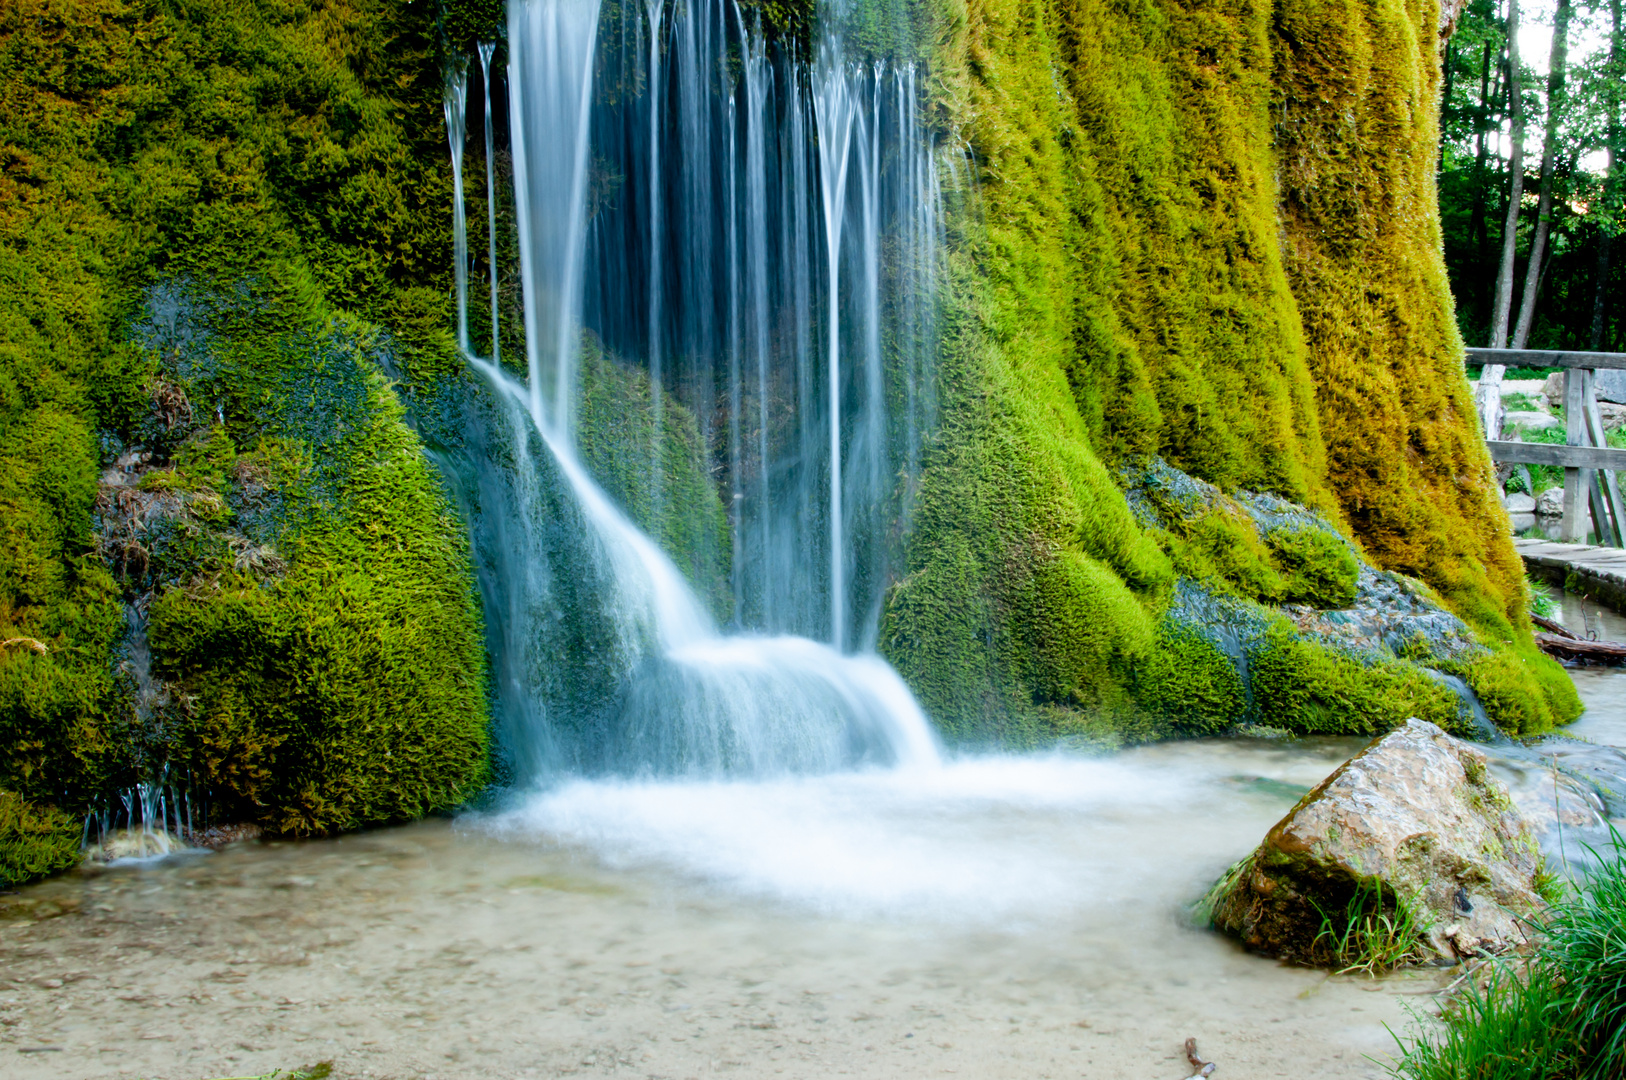 Wasserfall Fotos